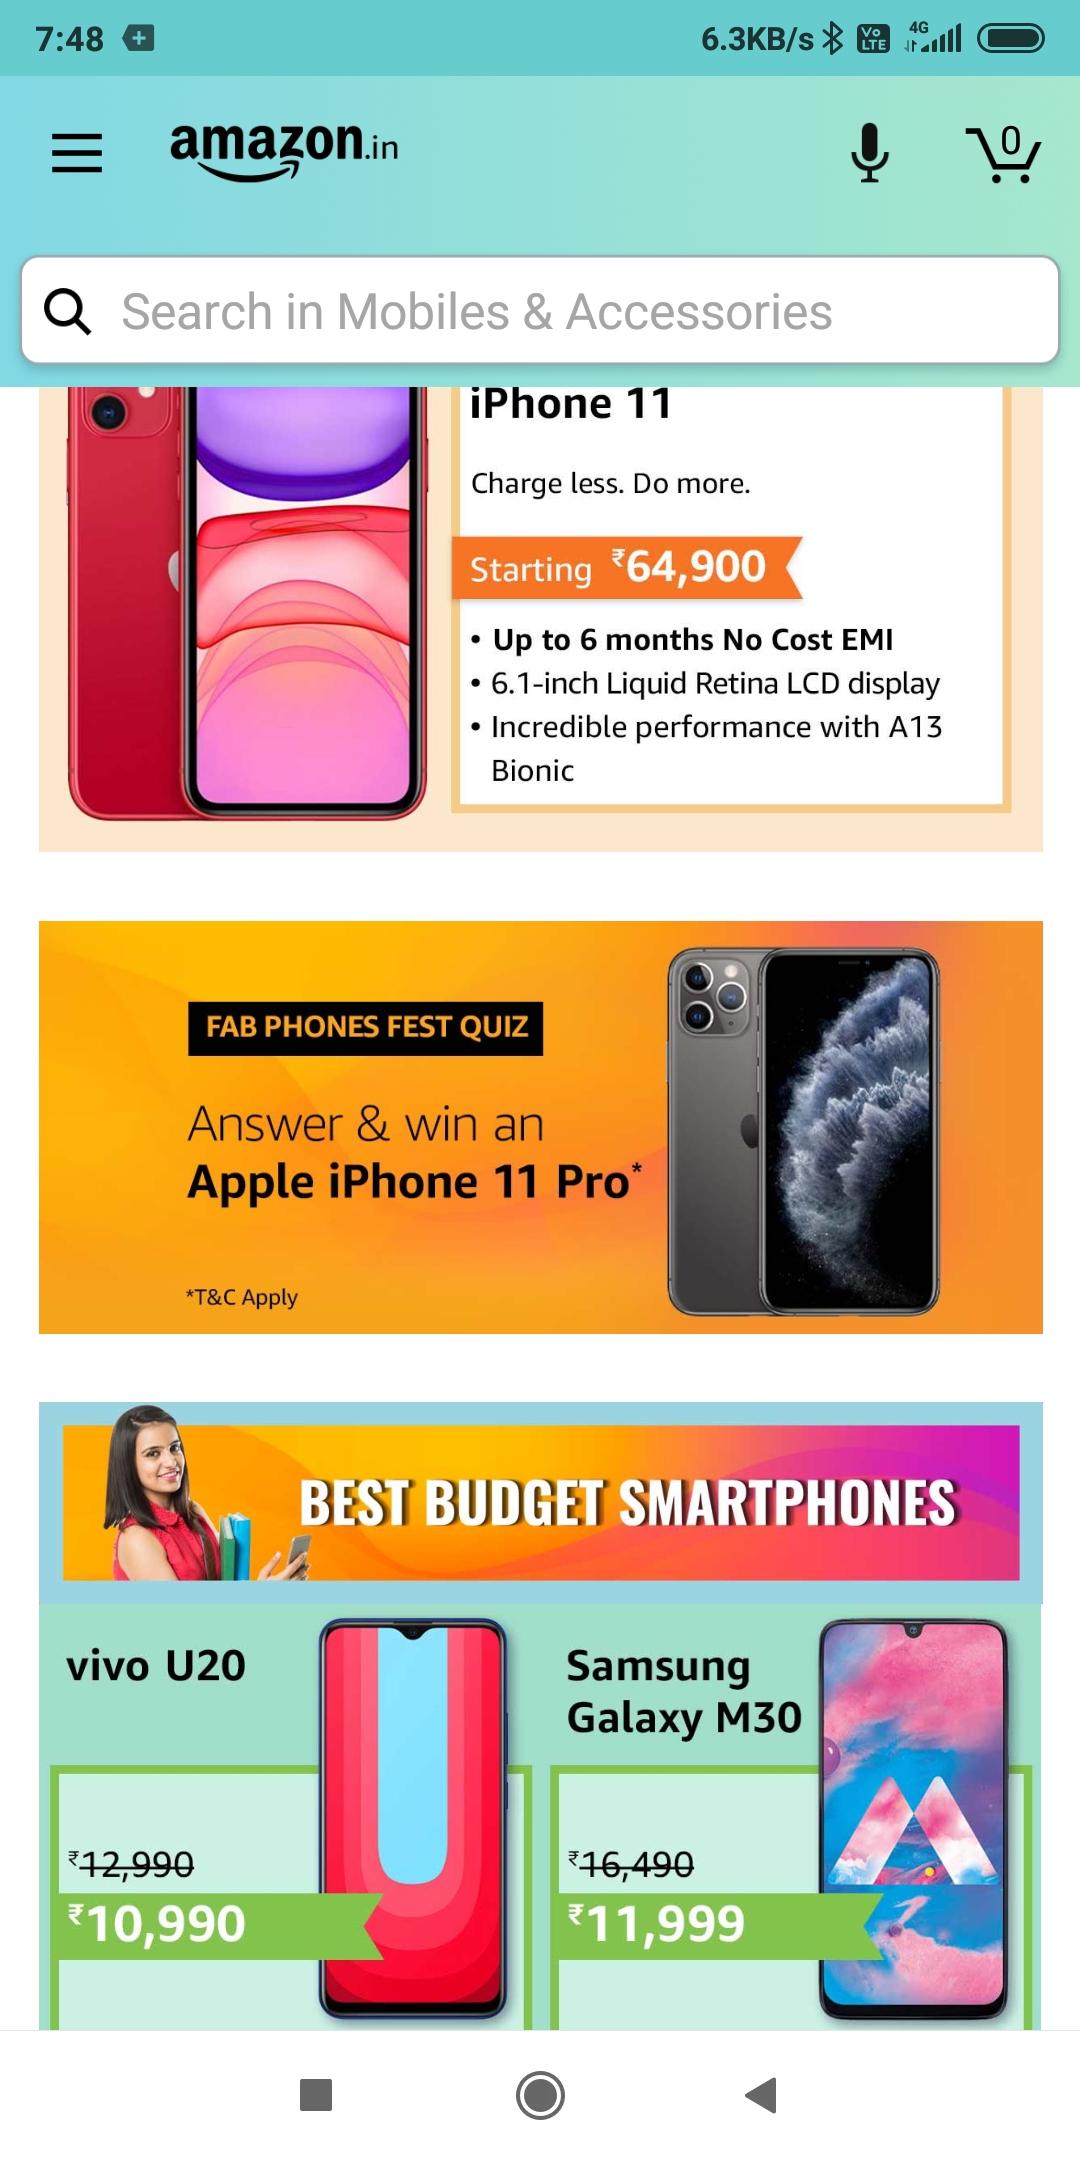 https://cdn0.desidime.com/attachments/photos/609013/original/Screenshot_2020-03-24-07-48-45-329_in.amazon.mShop.android.shopping.jpg?1585016443